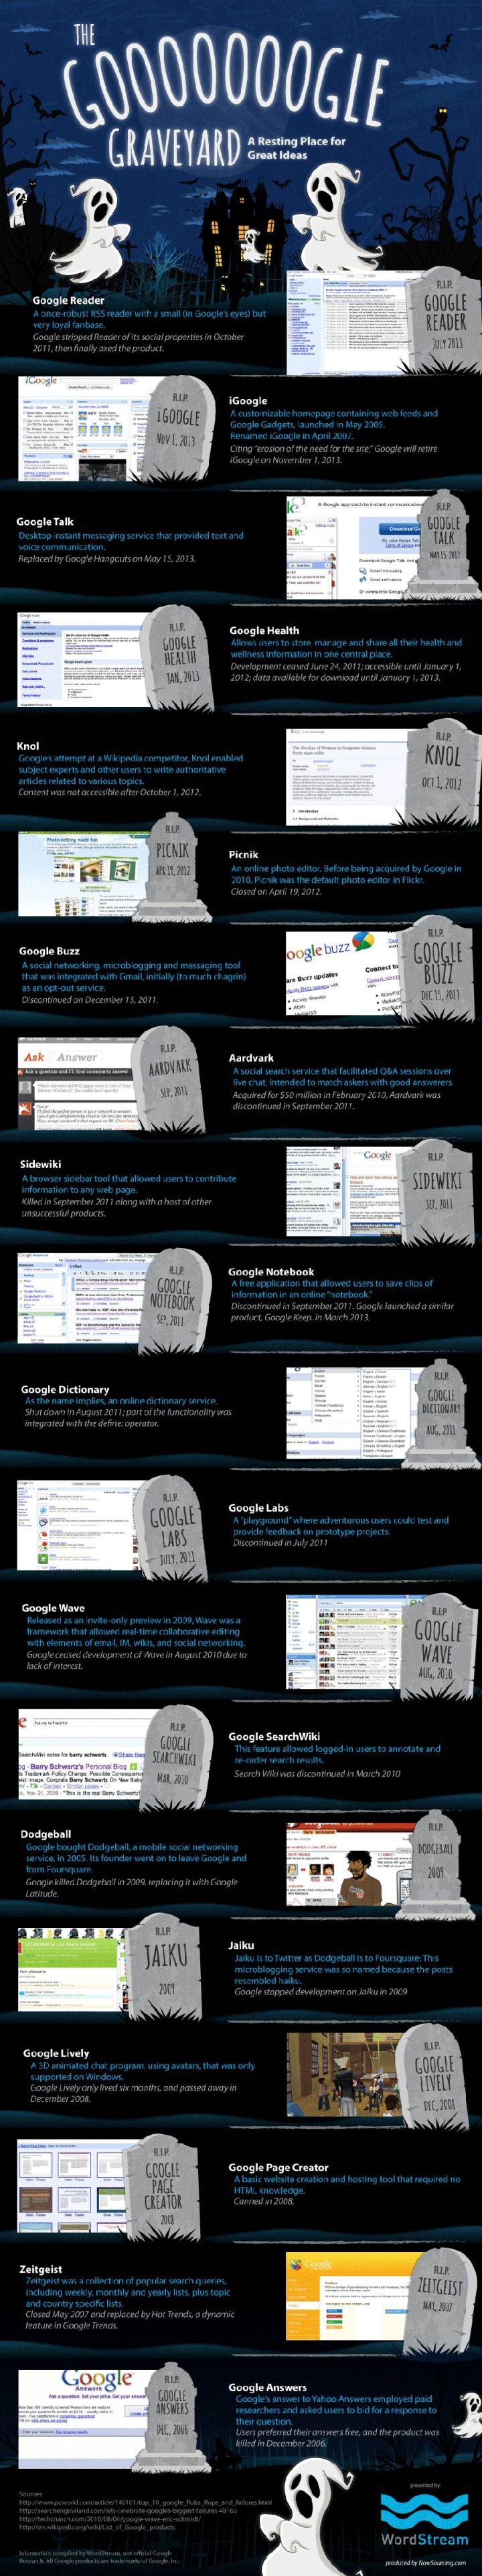 google-graveyard234